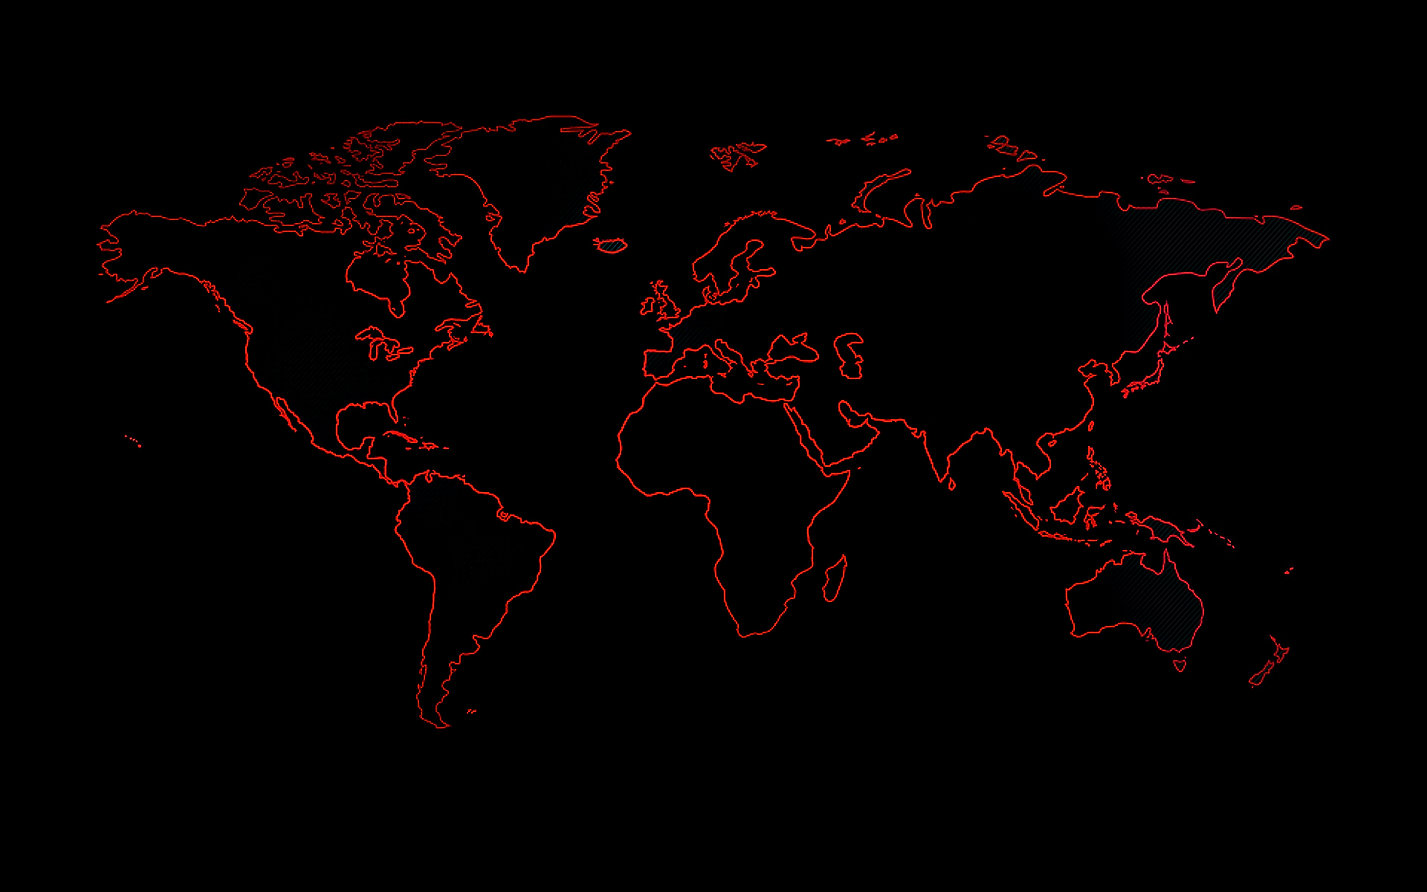 20200910-world_map.jpg